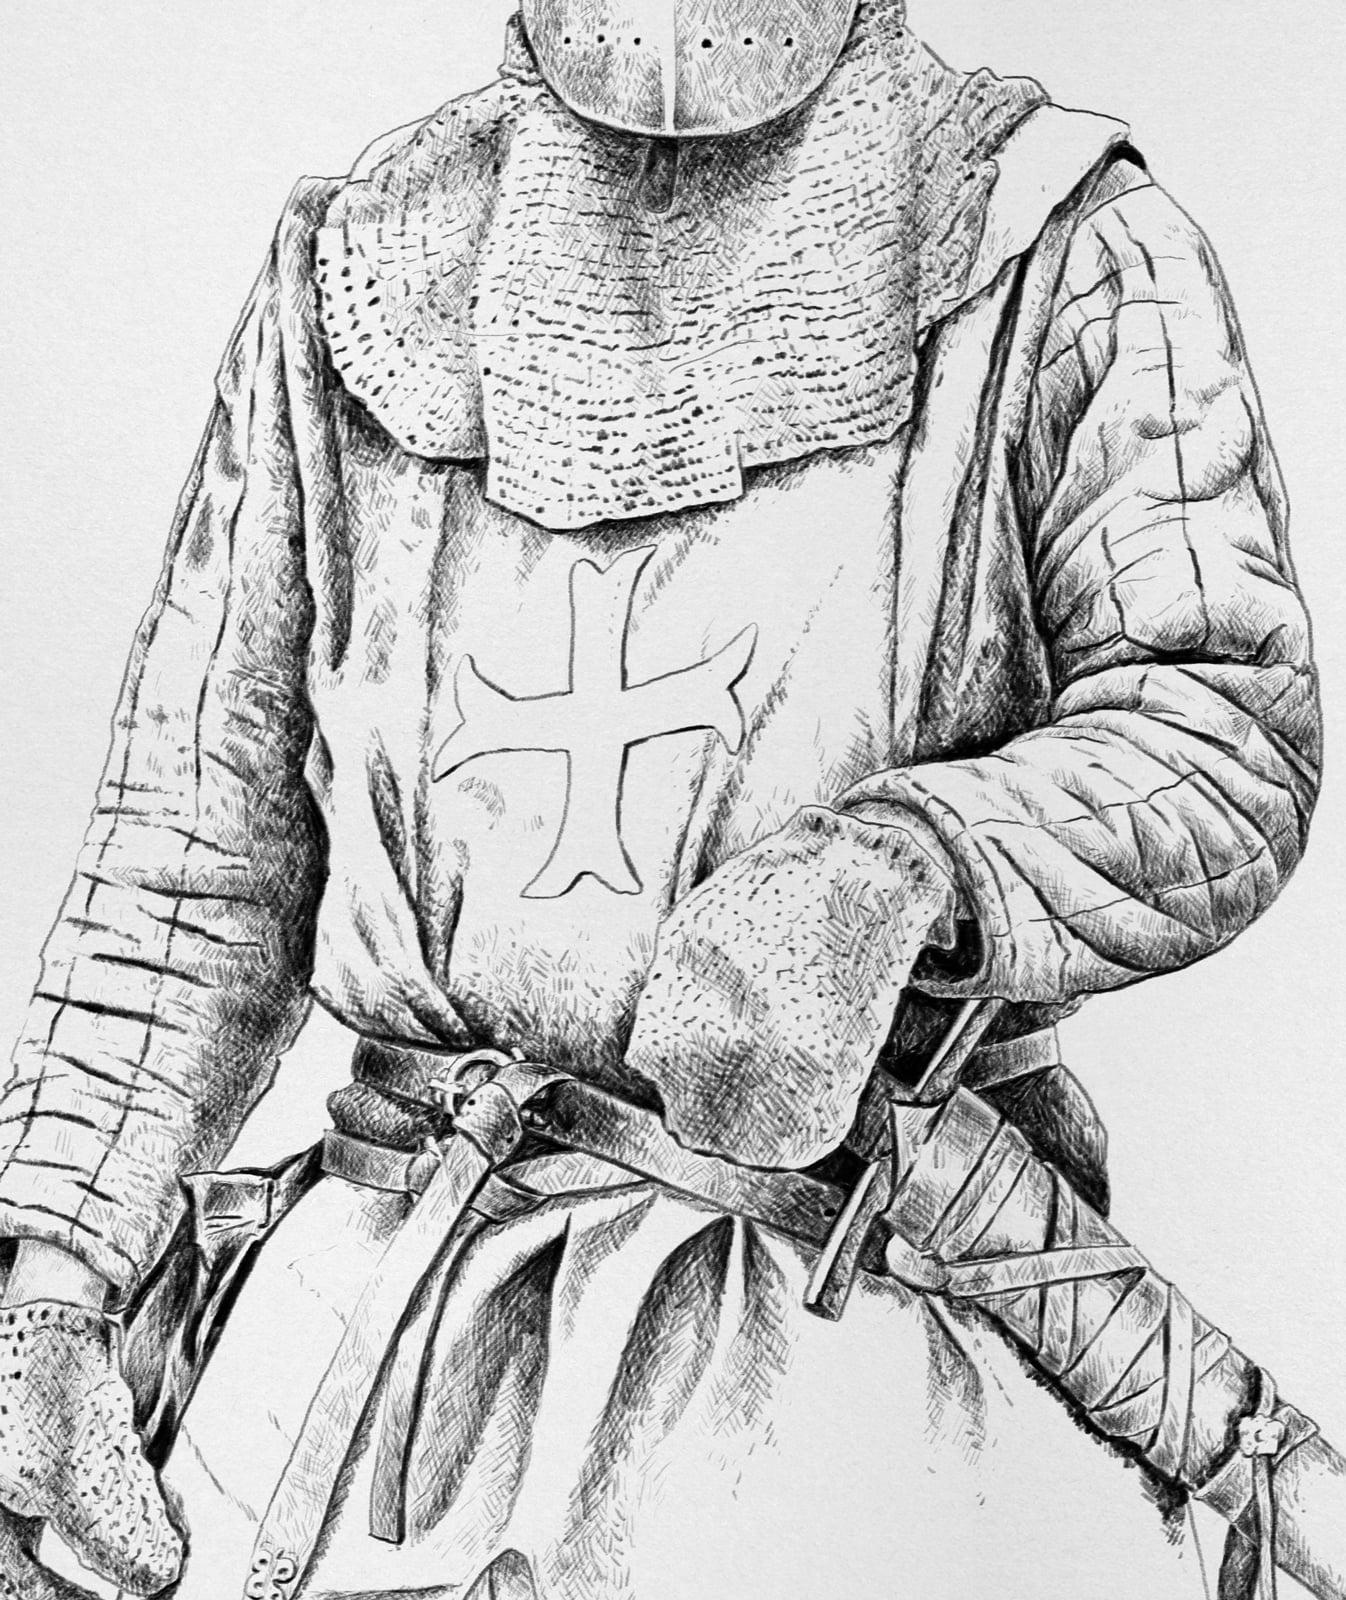 Medieval Knight, krak, ikonaut, ruestungen, zoom